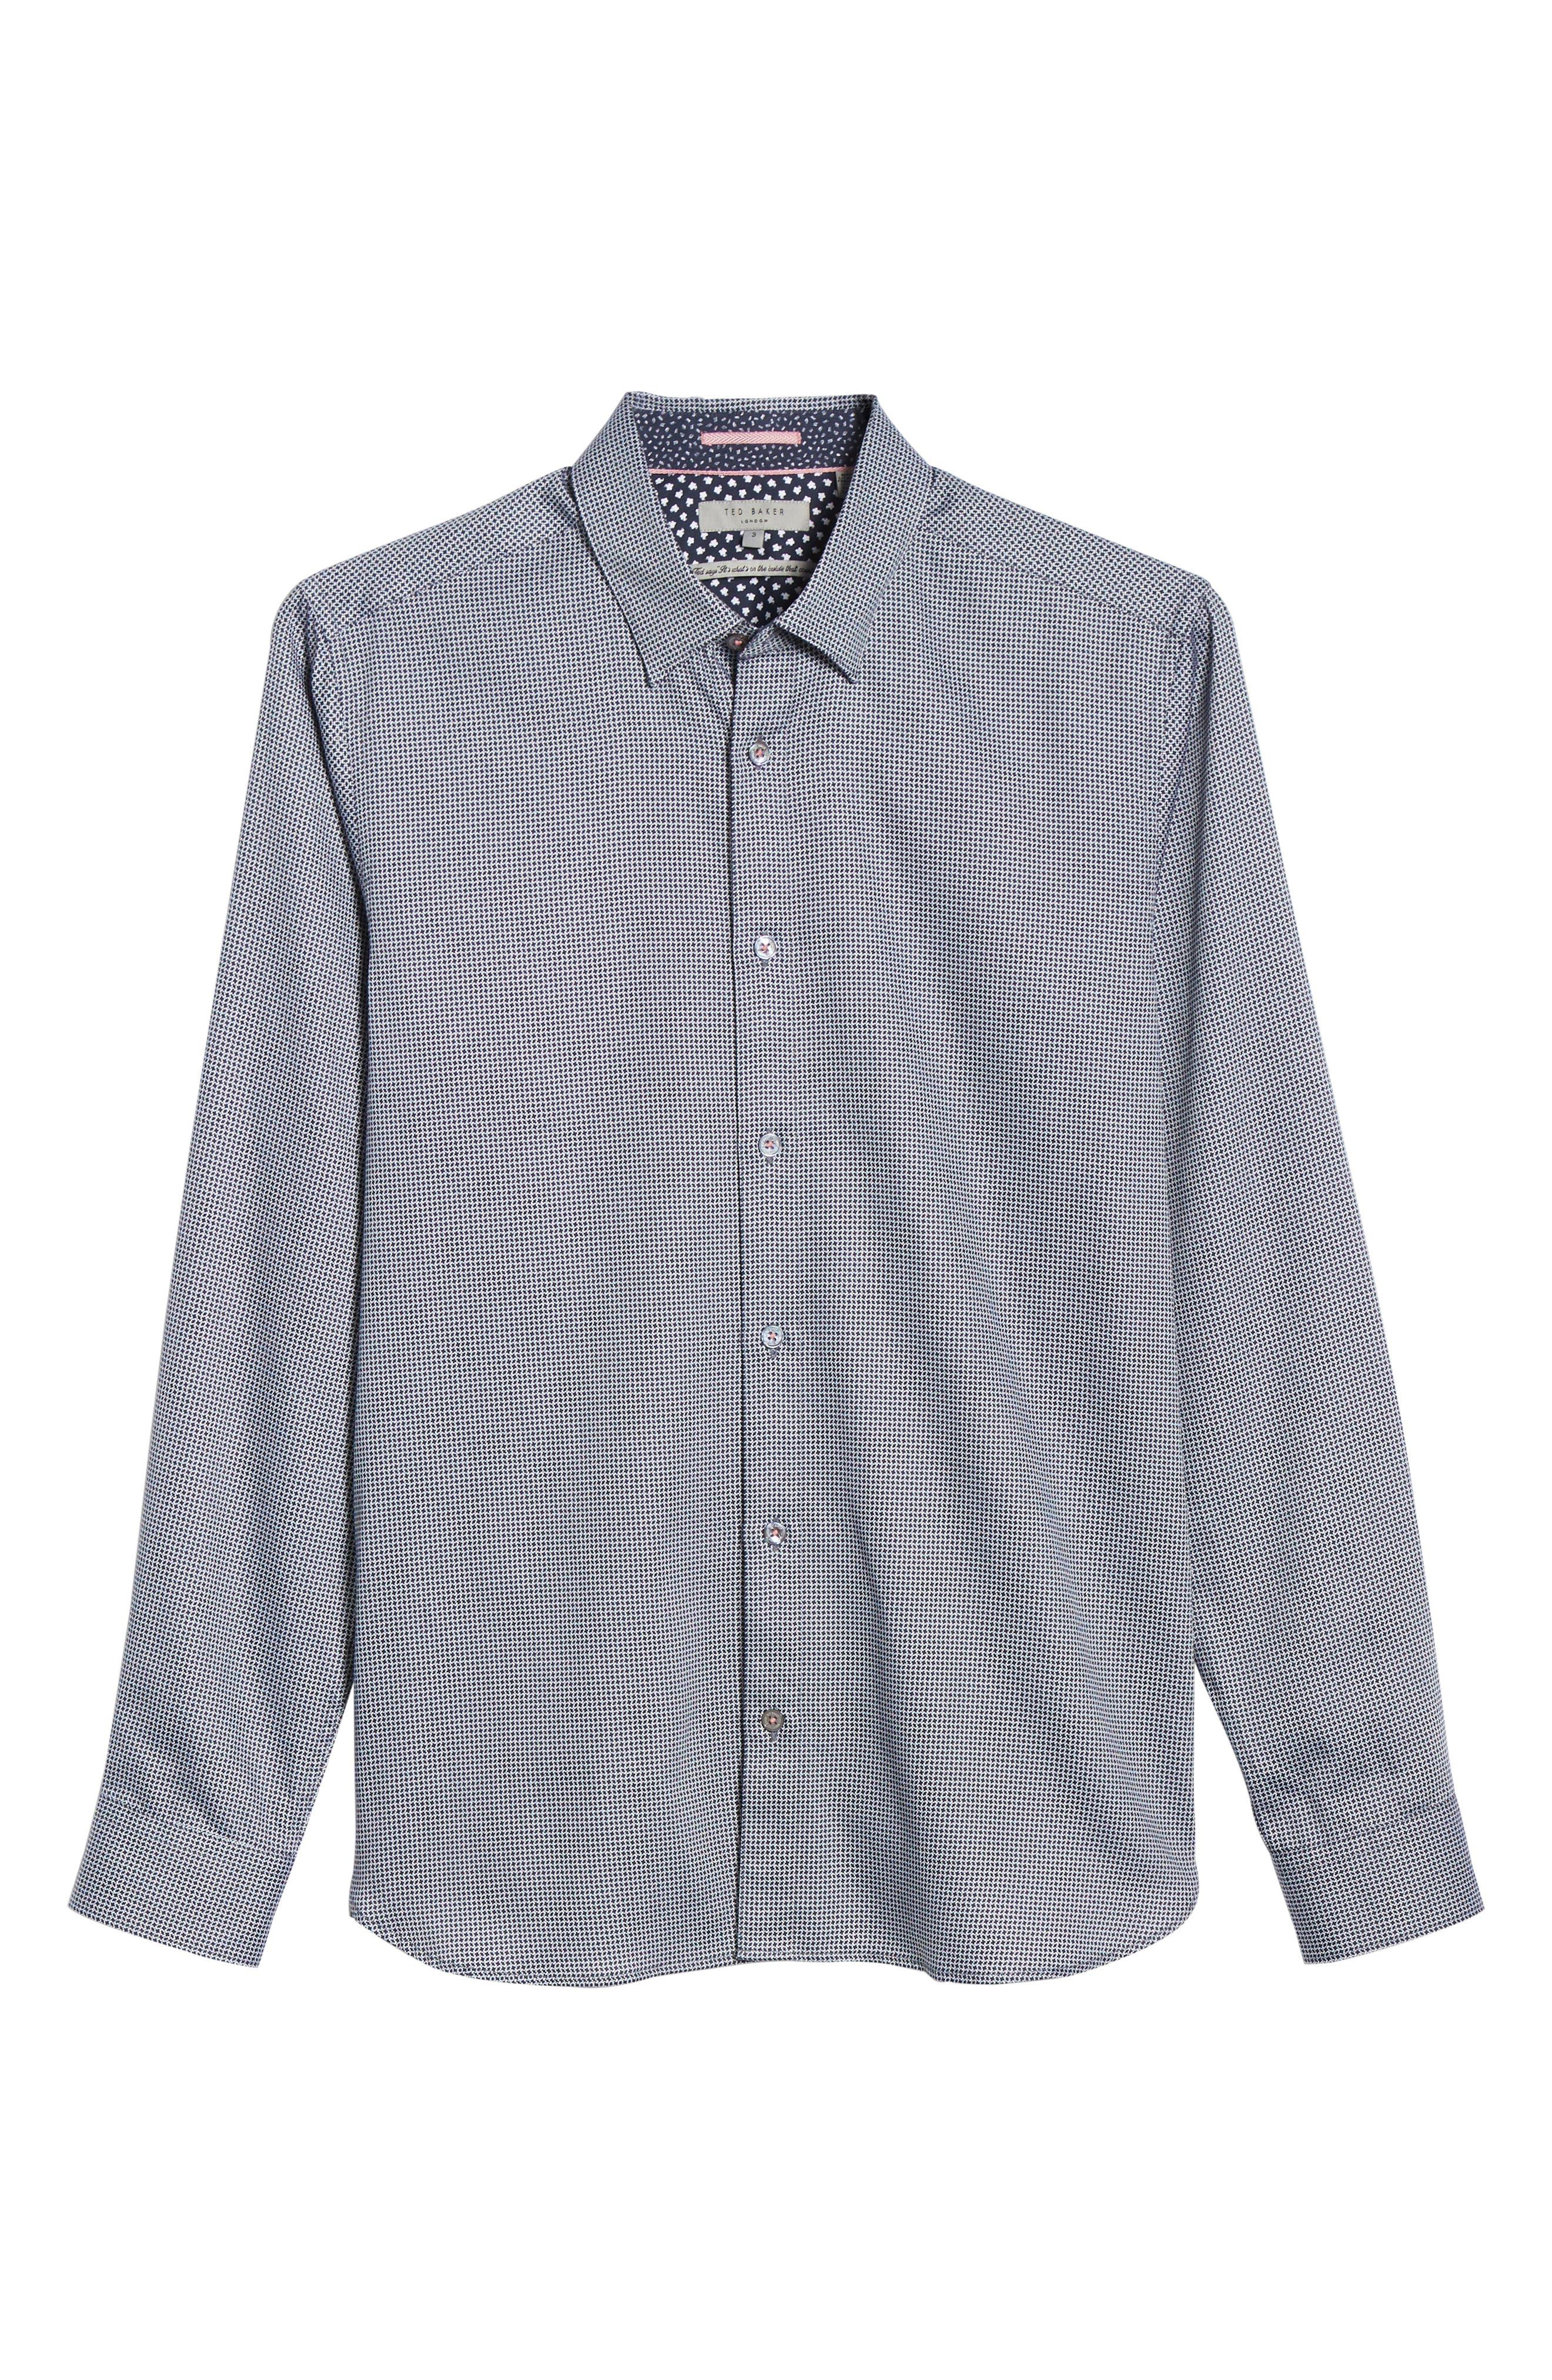 TED BAKER LONDON, Bloosem Slim Fit Print Sport Shirt, Alternate thumbnail 5, color, NAVY